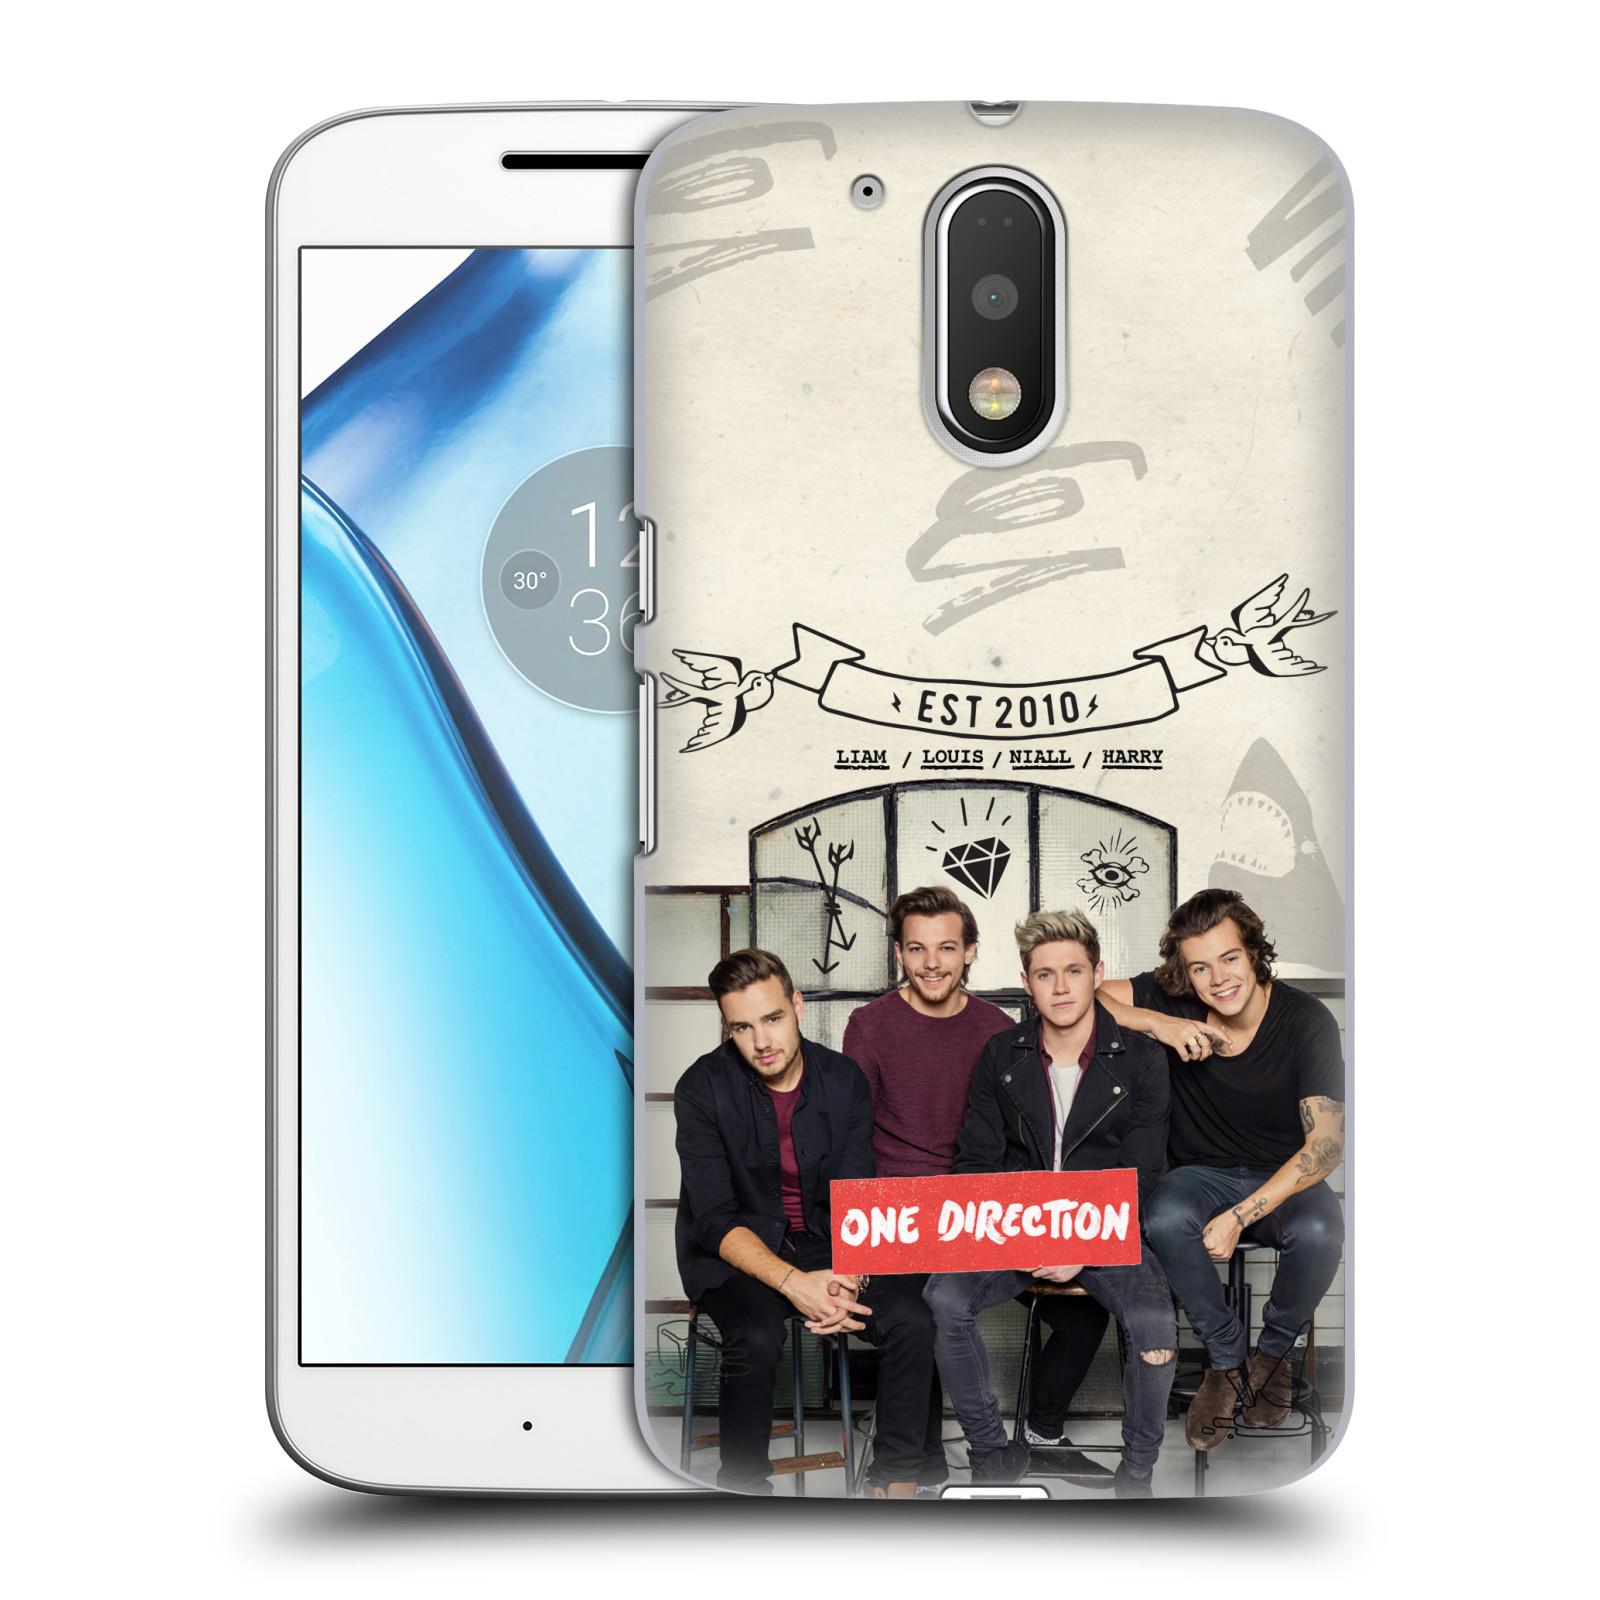 Plastové pouzdro na mobil Lenovo Moto G4 HEAD CASE One Direction - EST 2010 (Plastový kryt či obal One Direction Official na mobilní telefon Lenovo Moto G4 (Single a Dual SIM))